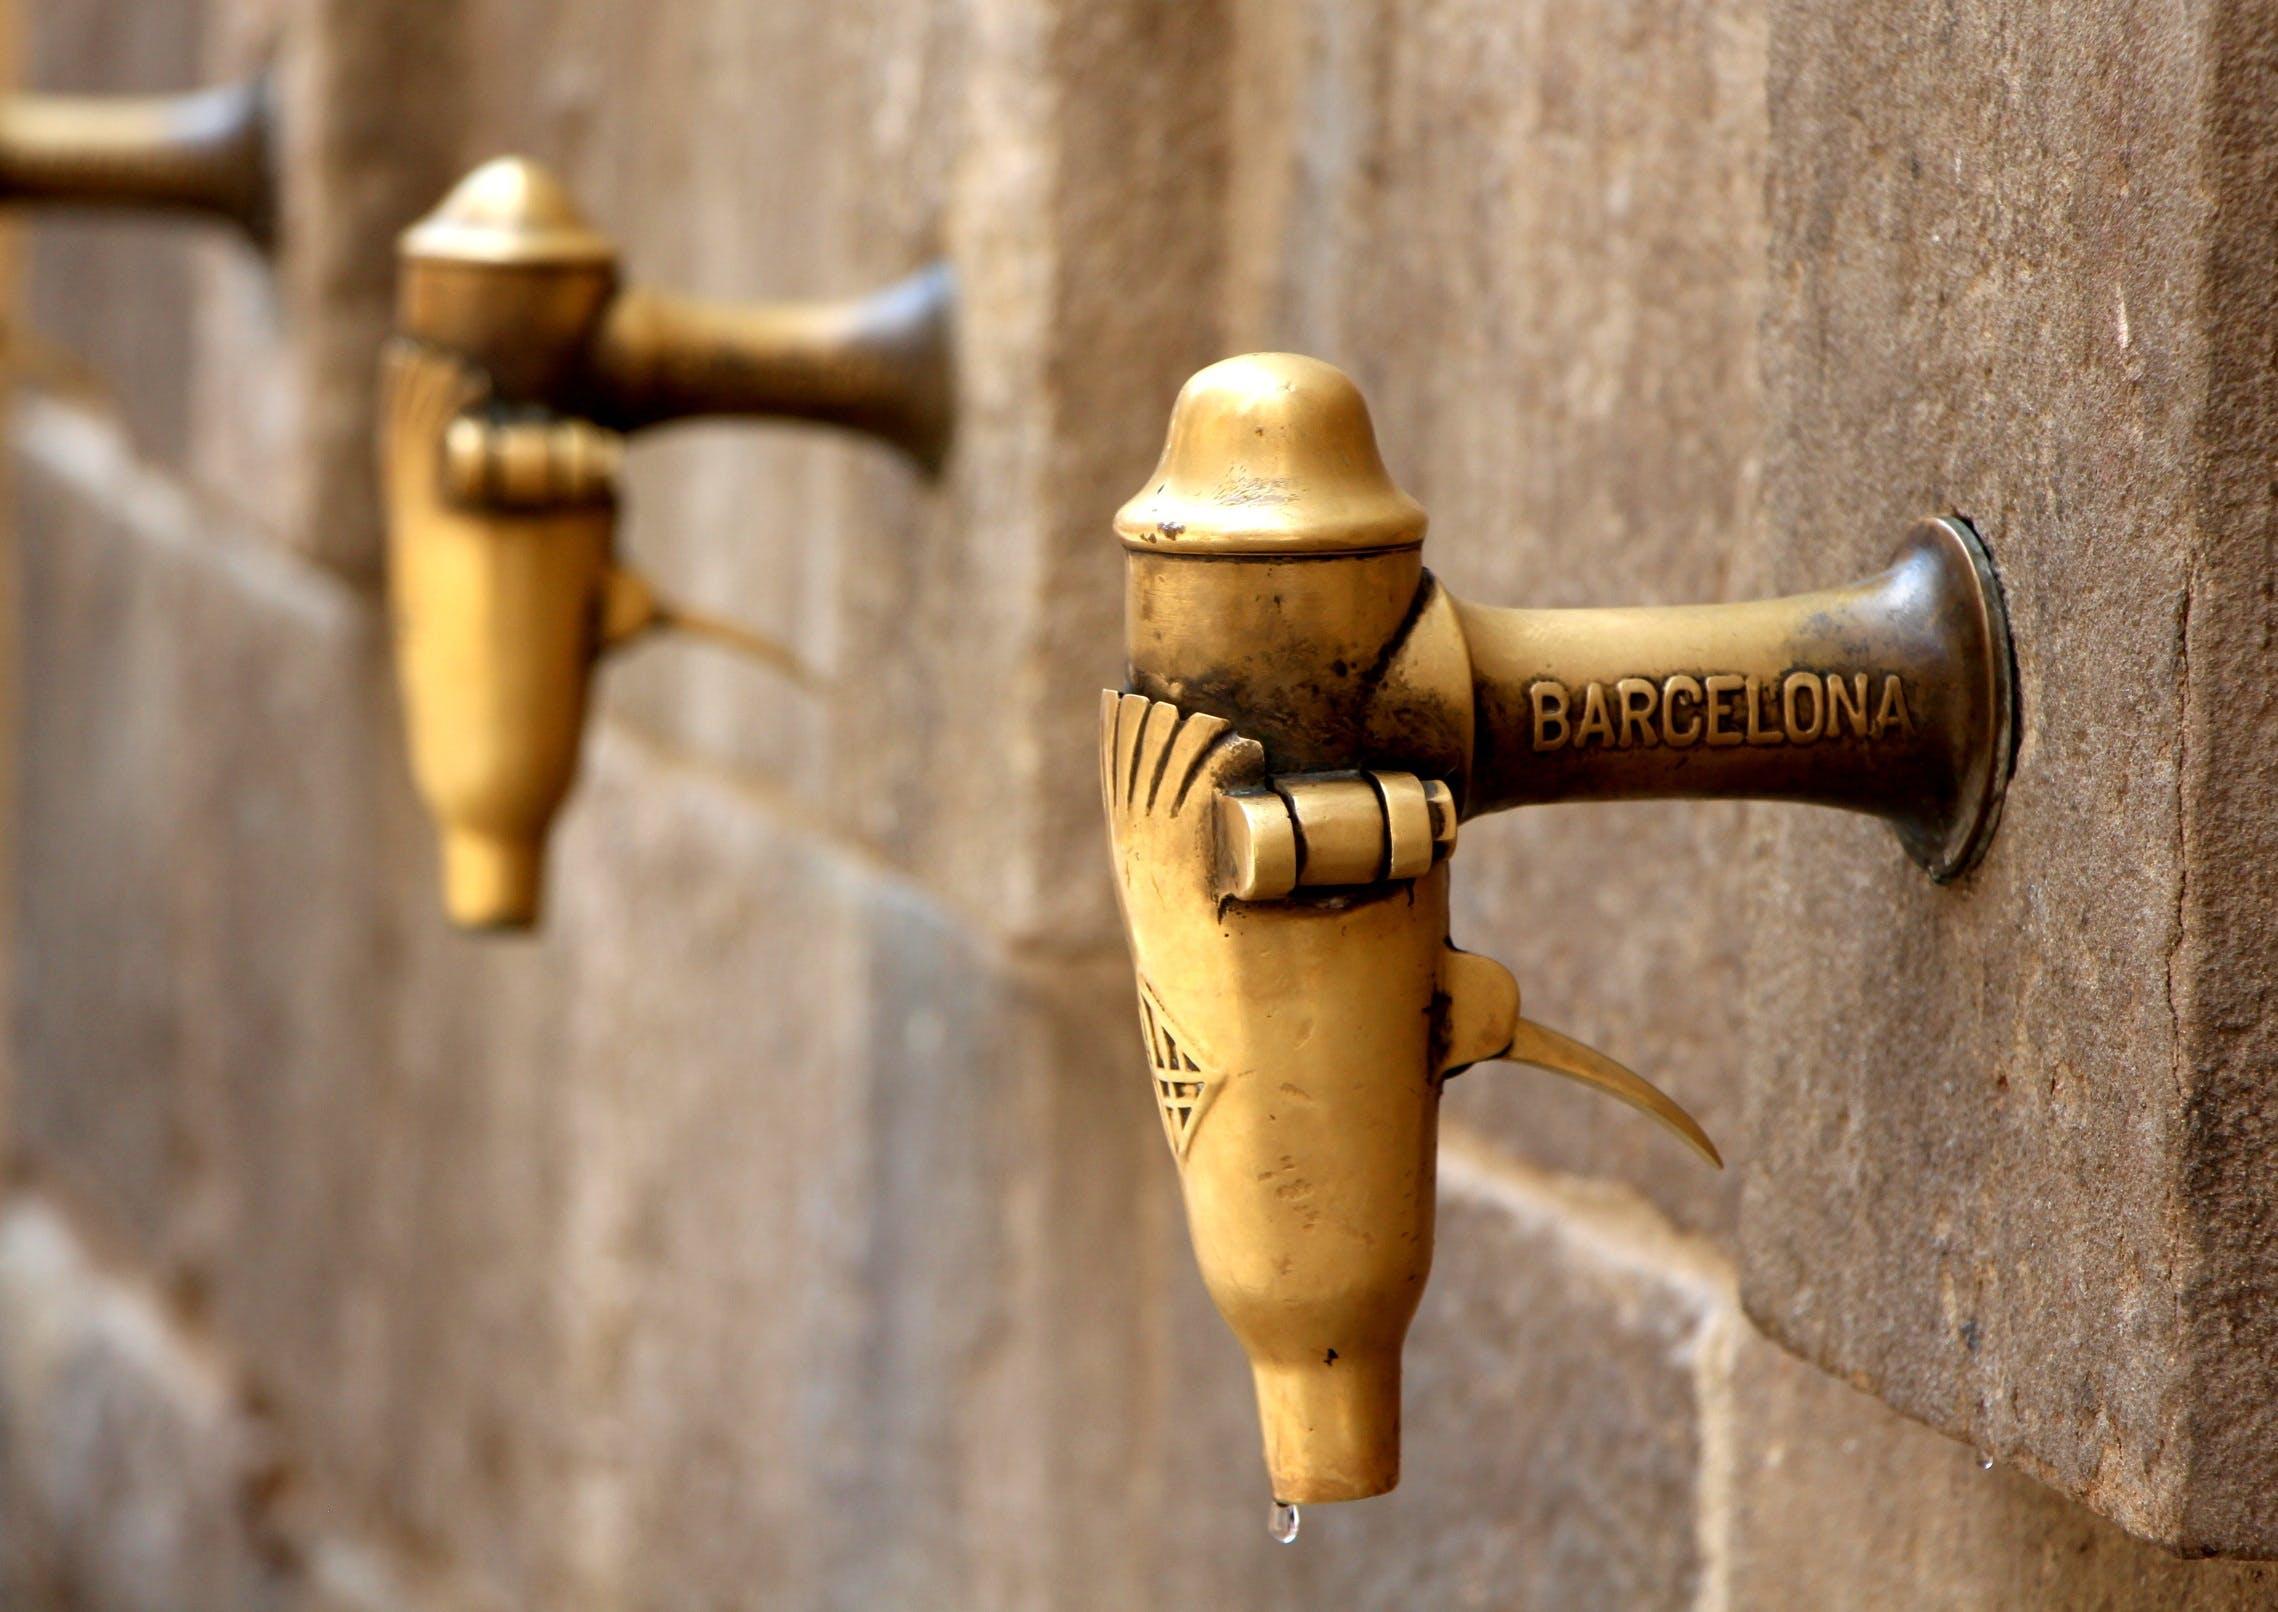 barcelona, tap, thirst